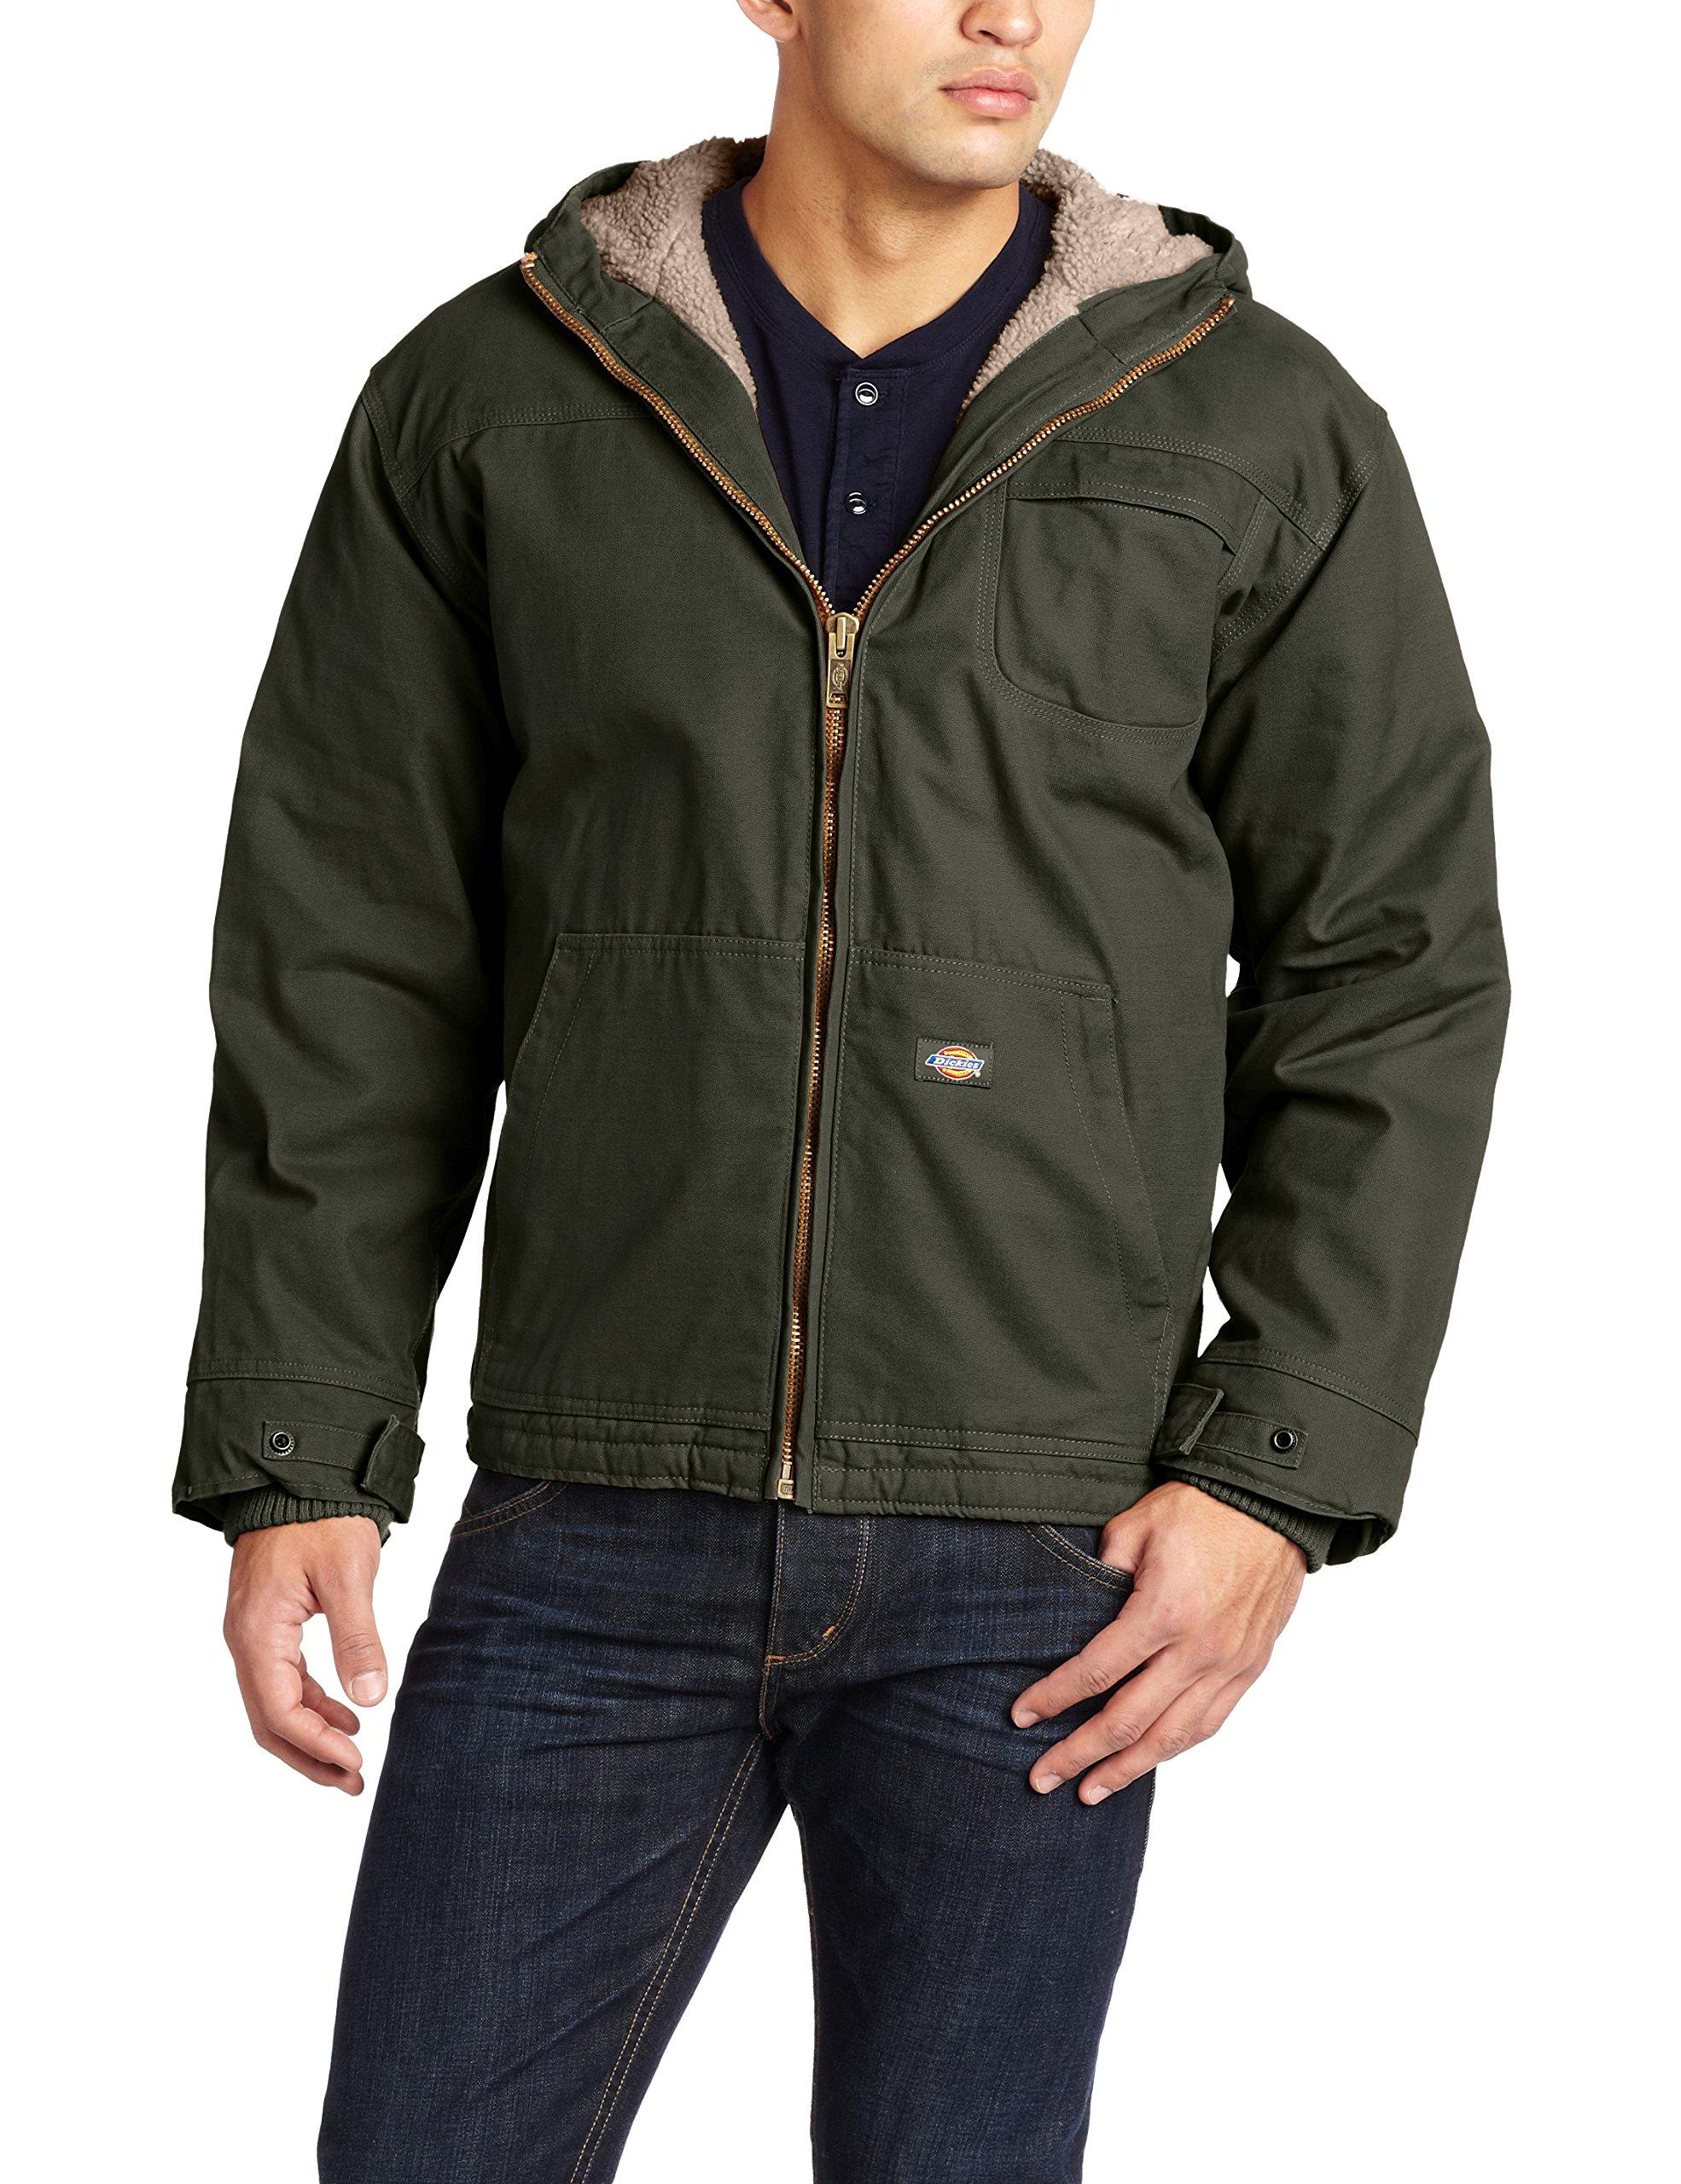 Dickies Men's Sanded Duck Sherpa Lined Hooded Jacket, Black Olive, Large/Regular